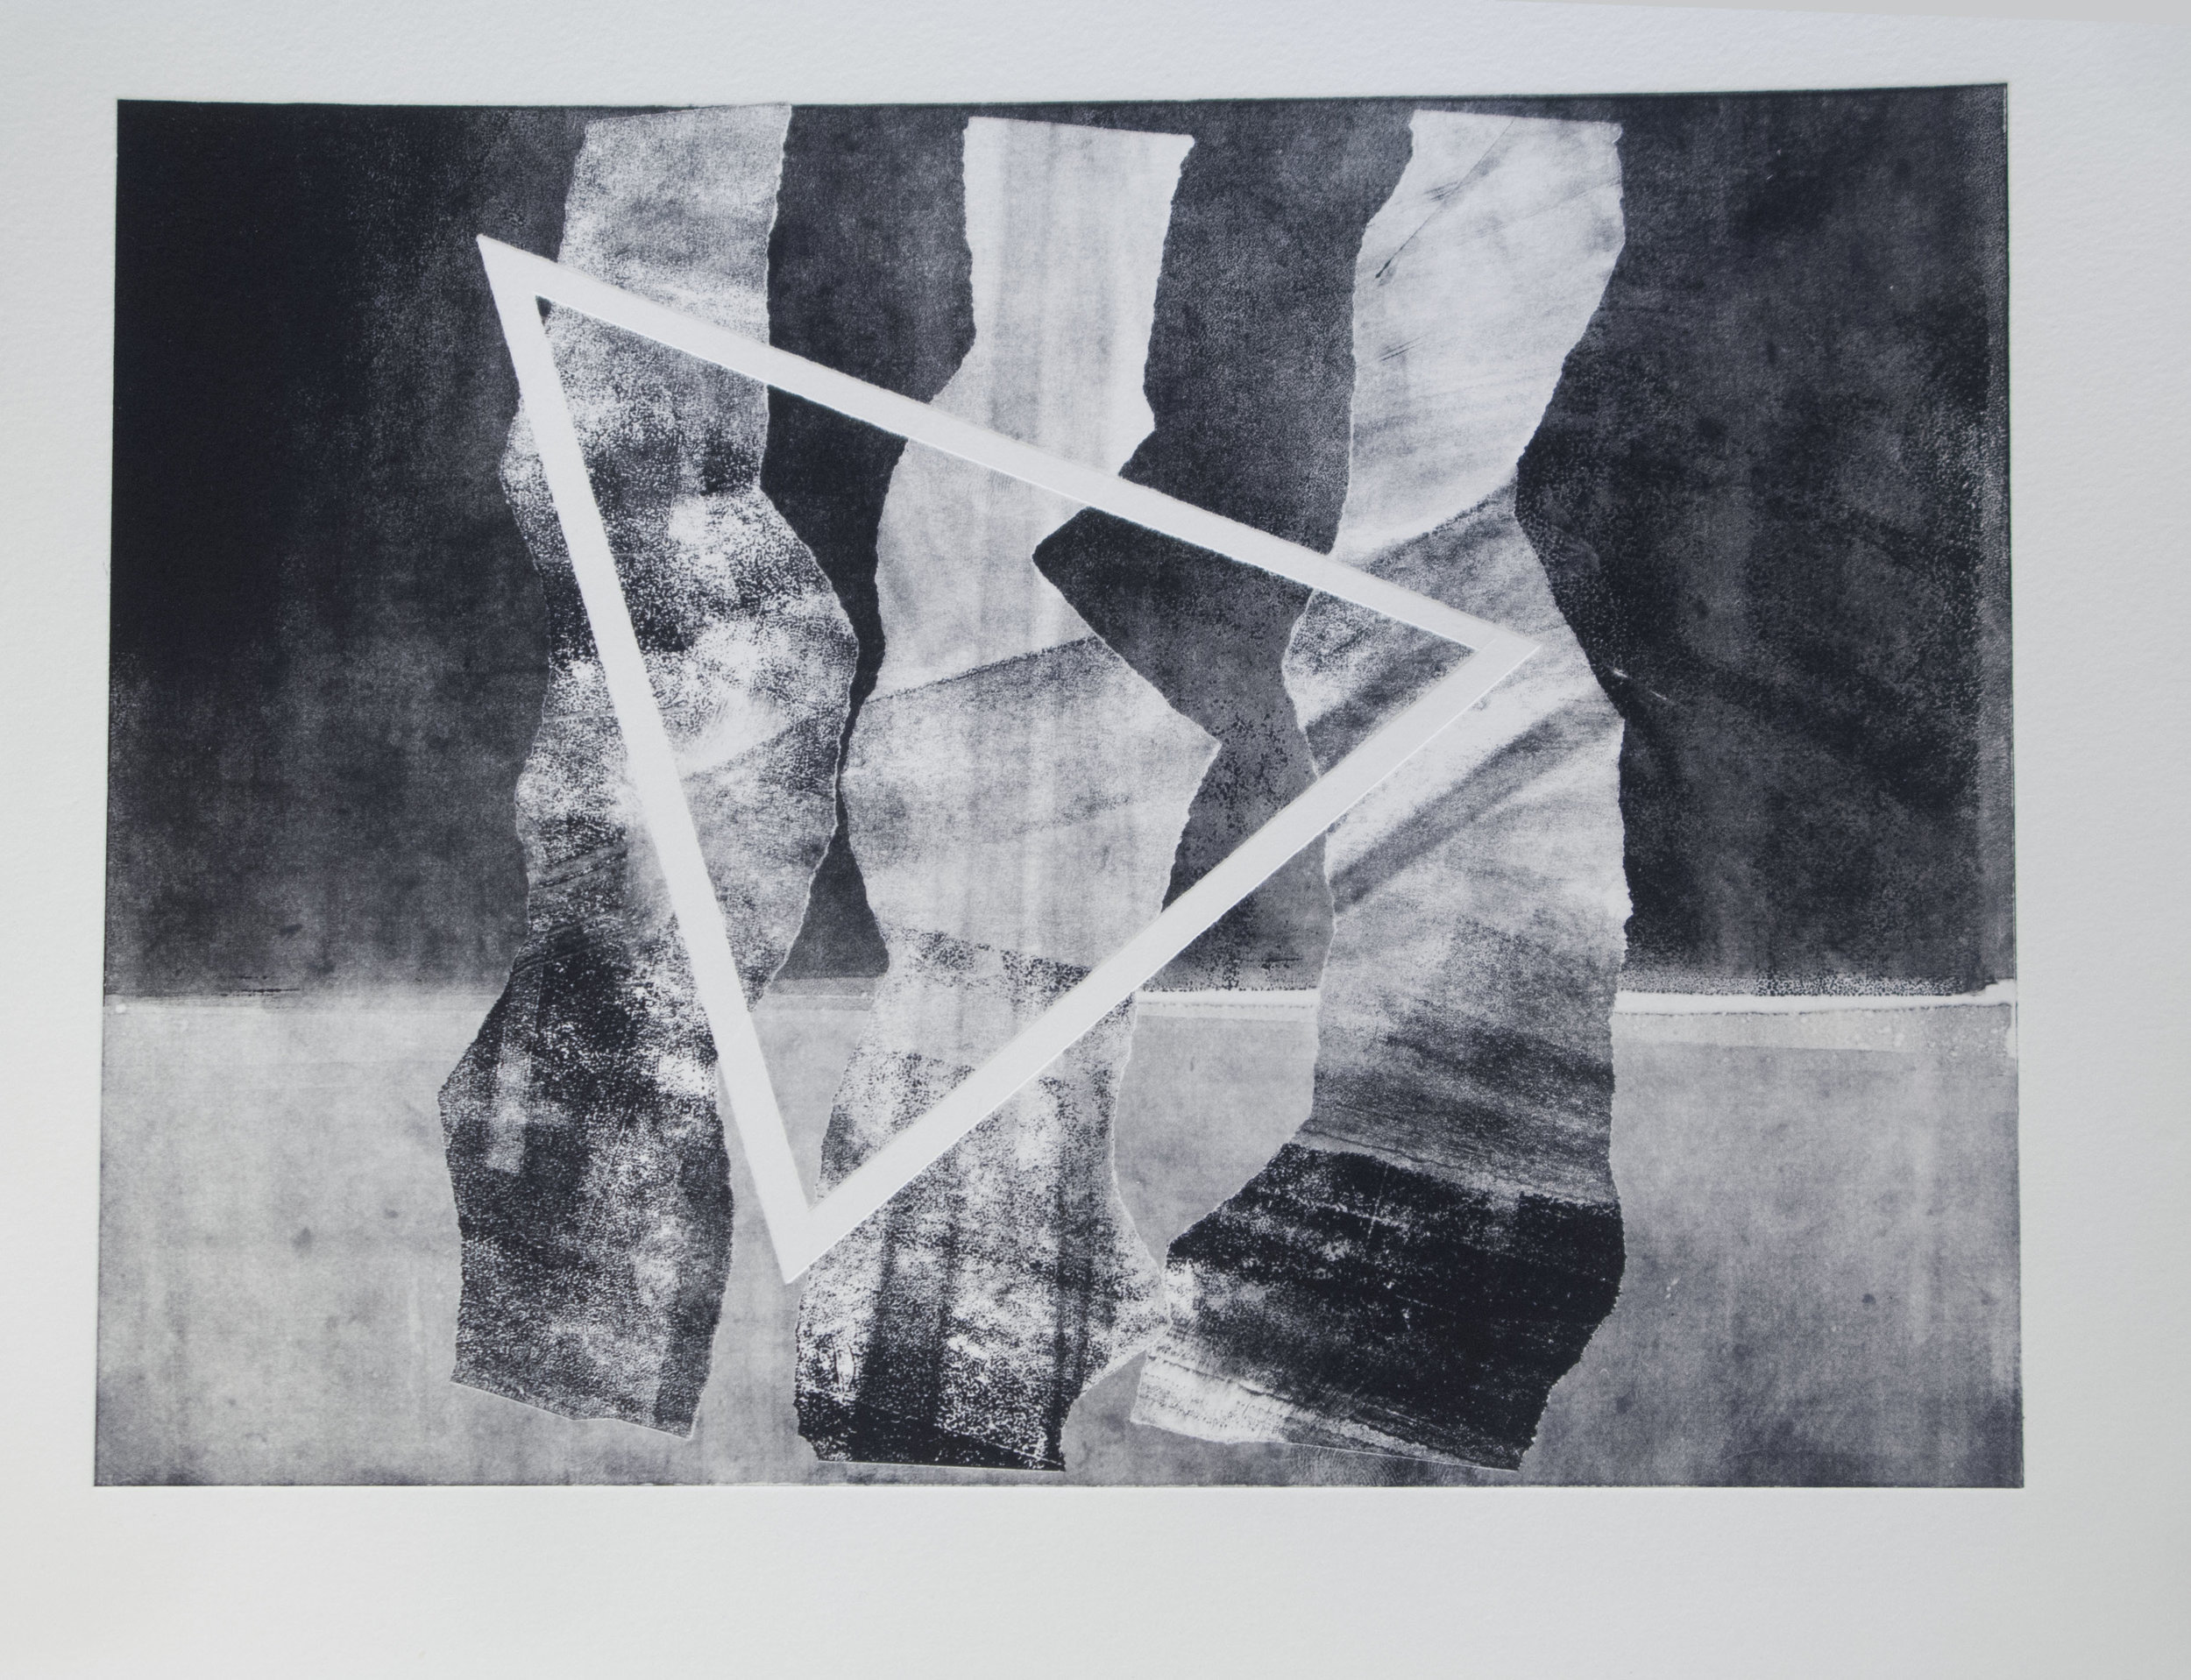 Forms on black 14 (32cm x 26 cm)